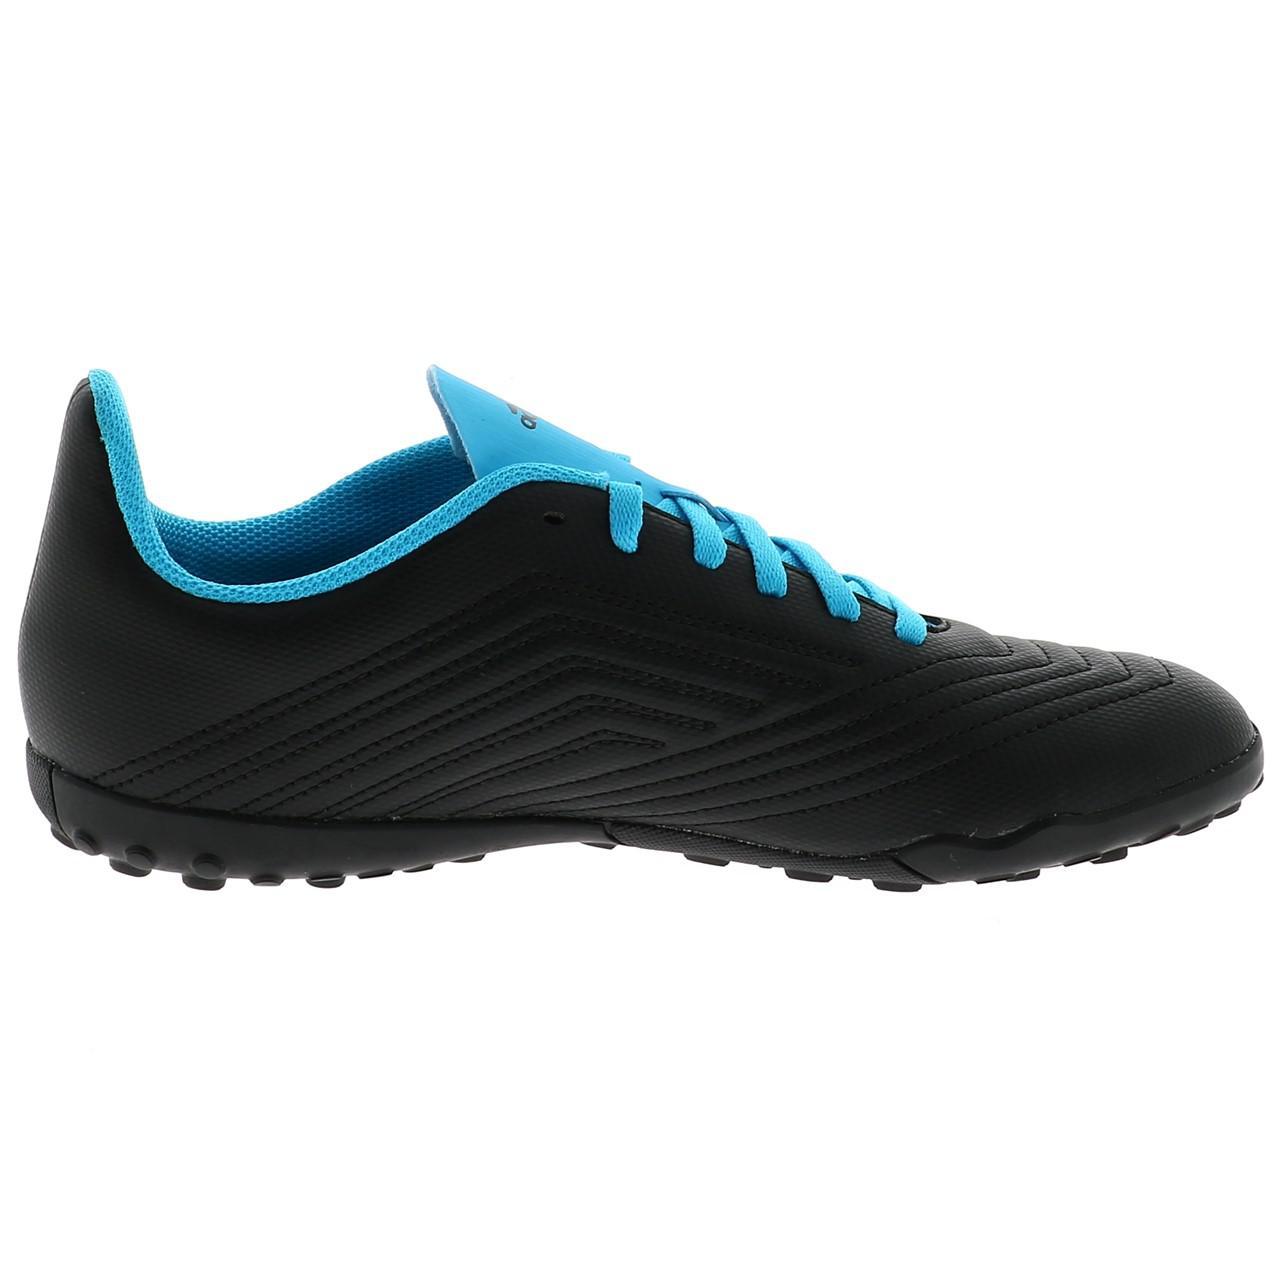 Football-Shoes-Stabilized-Adidas-Predator-19-4-Tf-Jmoule-Jr-Black-42177-N thumbnail 4